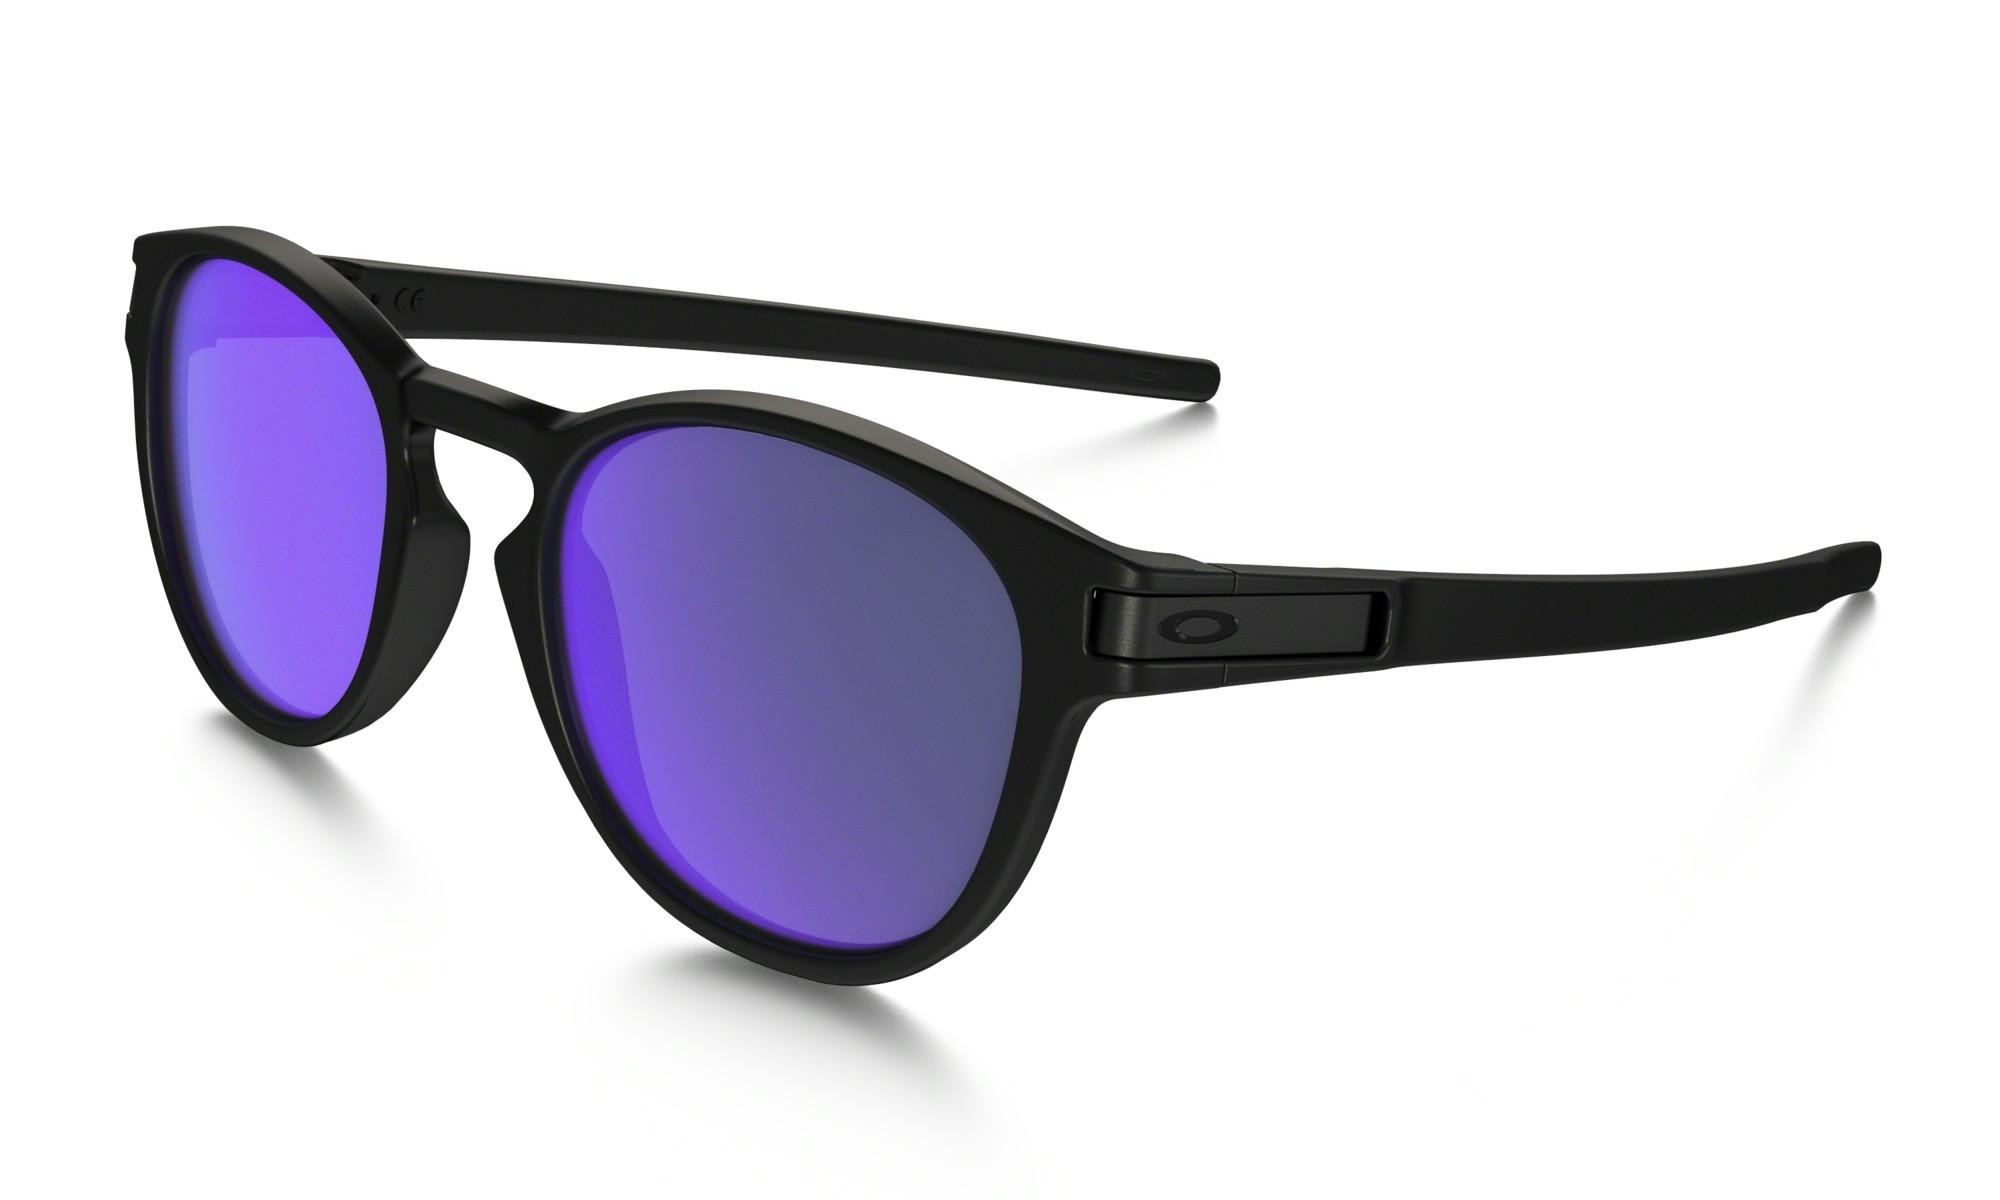 Lunettes De Soleil Oakley Latch Matte Black Violet Iridium - PRECISION SKI 863e2aad7aa4